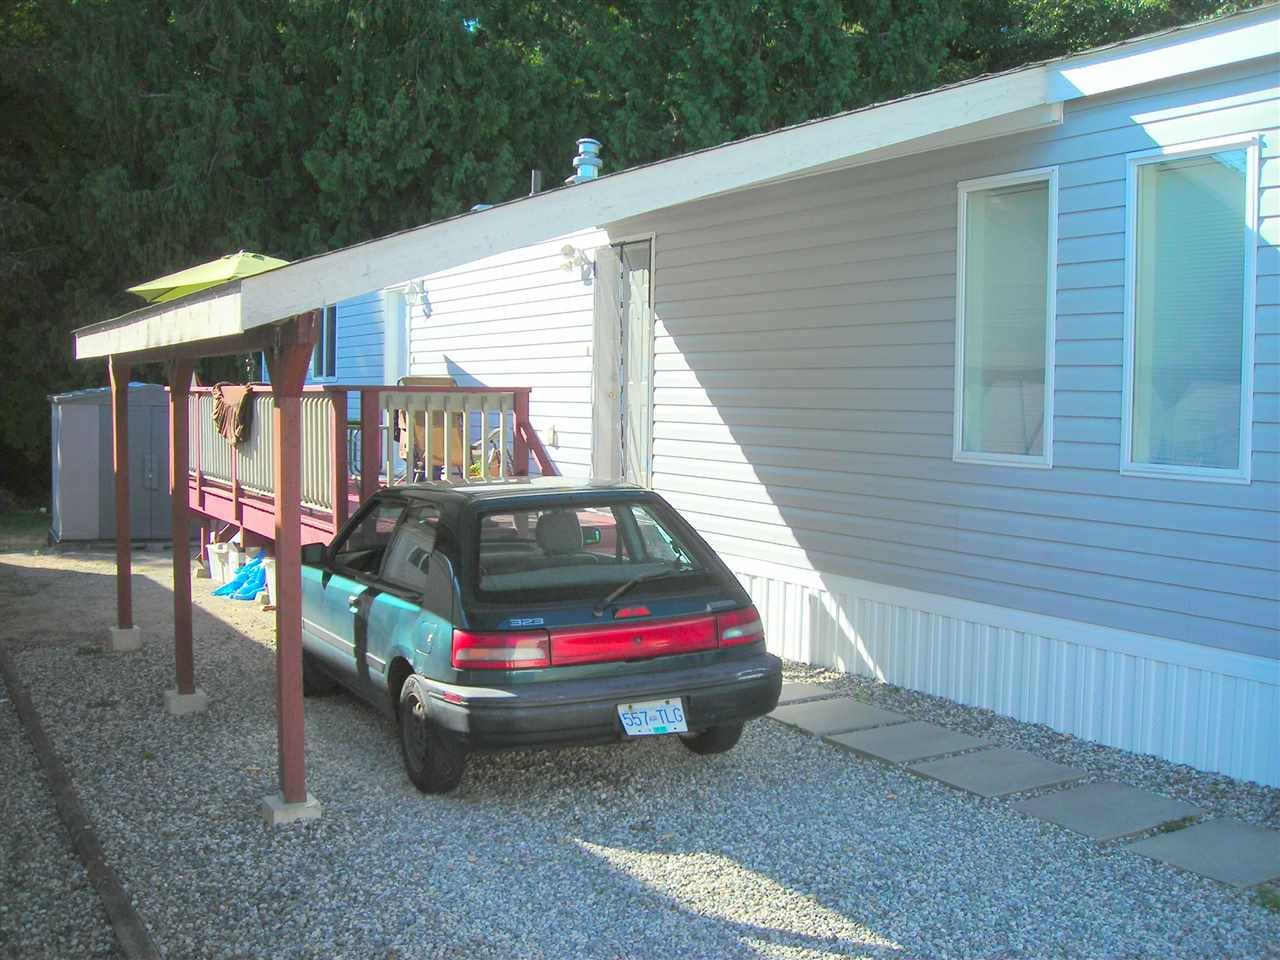 Photo 2: Photos: 5 5575 MASON Road in Sechelt: Sechelt District Manufactured Home for sale (Sunshine Coast)  : MLS®# R2099837